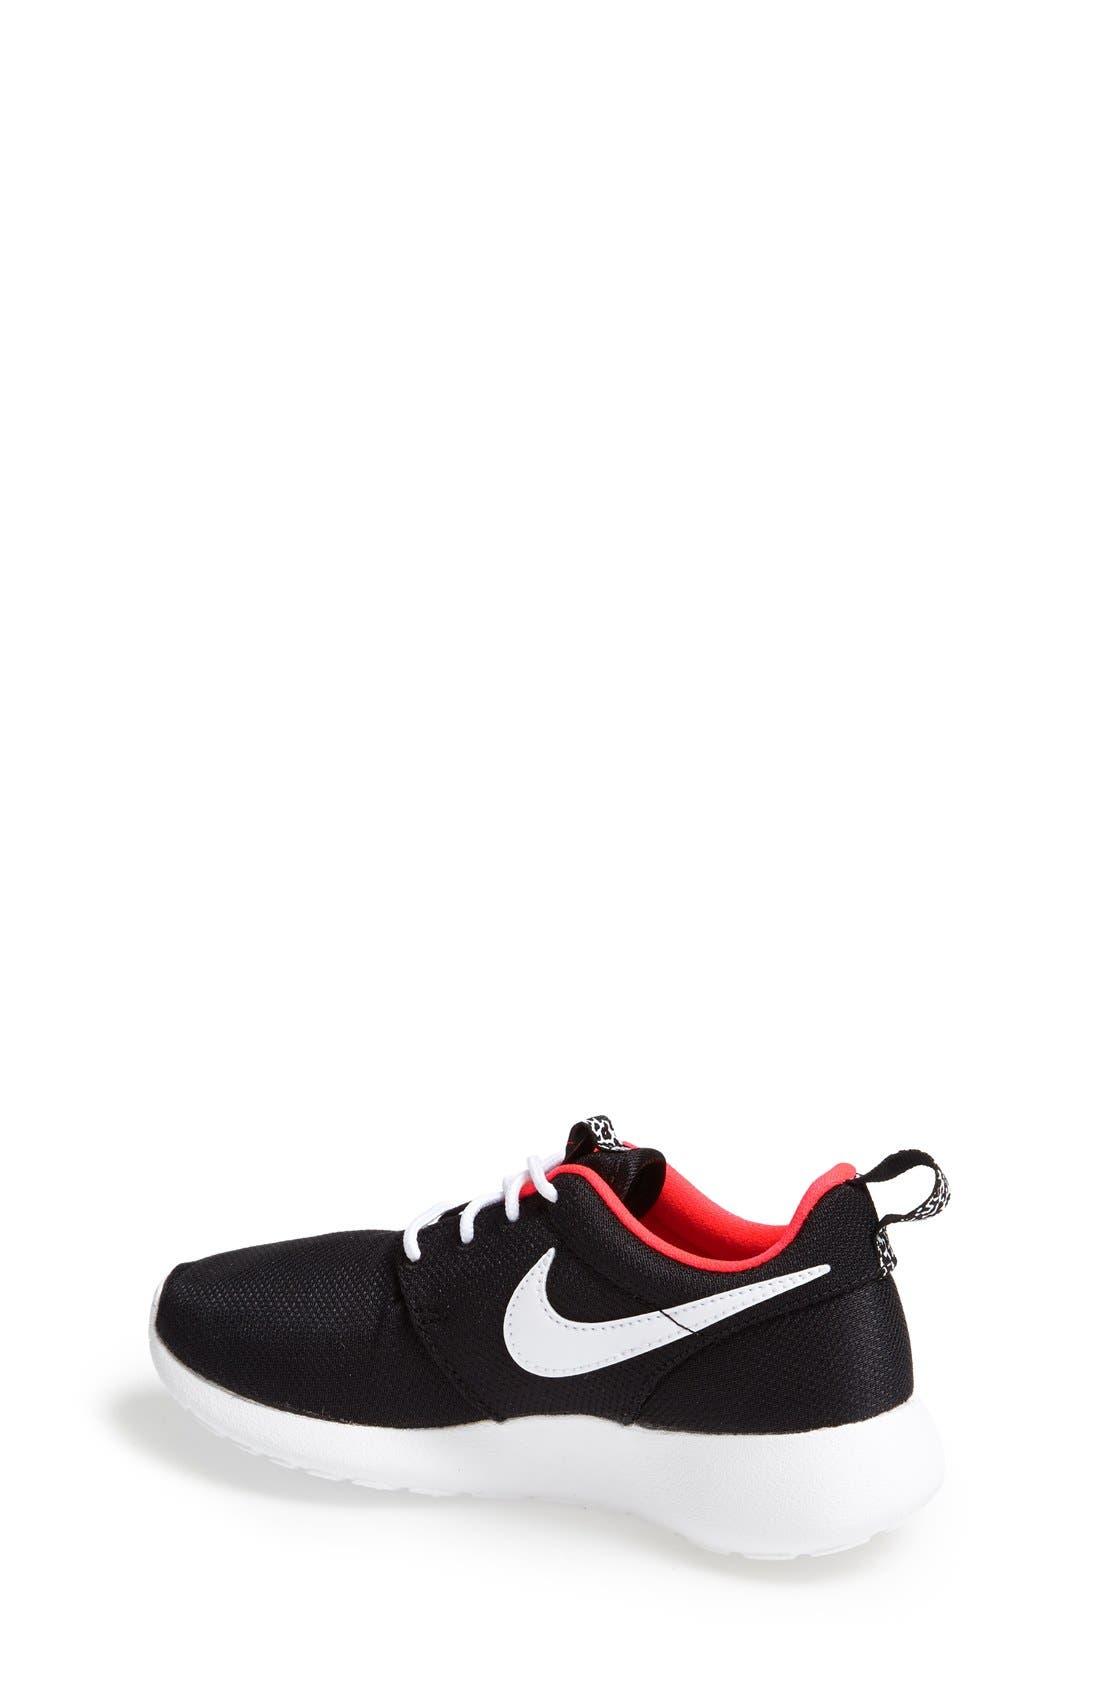 'Roshe Run' Athletic Shoe,                             Alternate thumbnail 72, color,